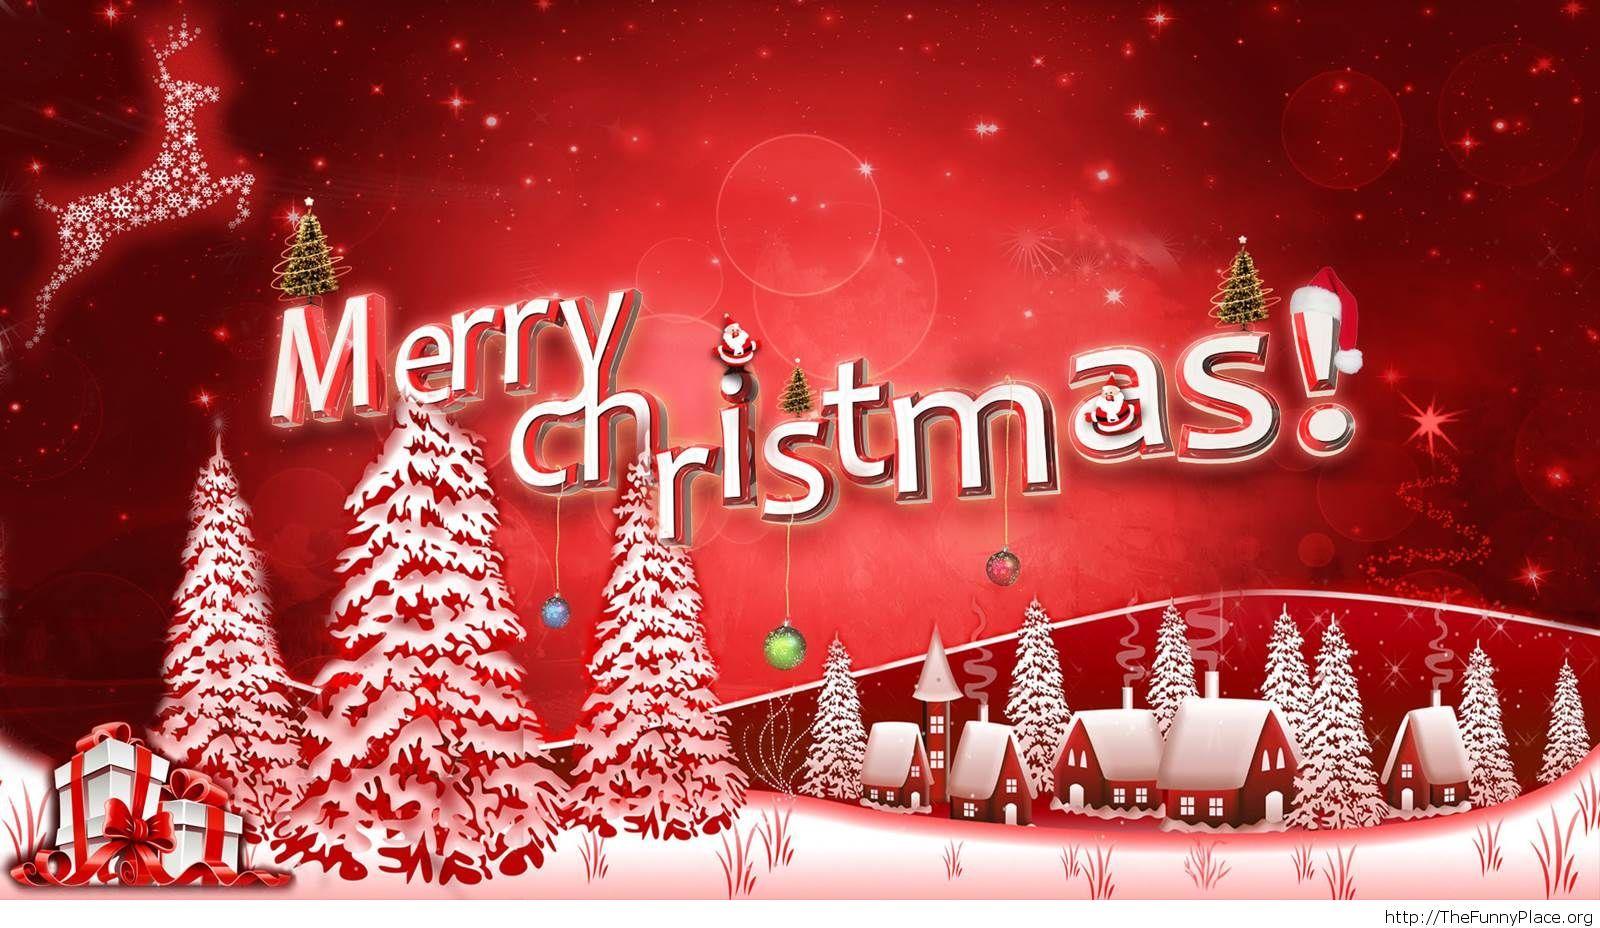 Merry Christmas beautiful image 2014